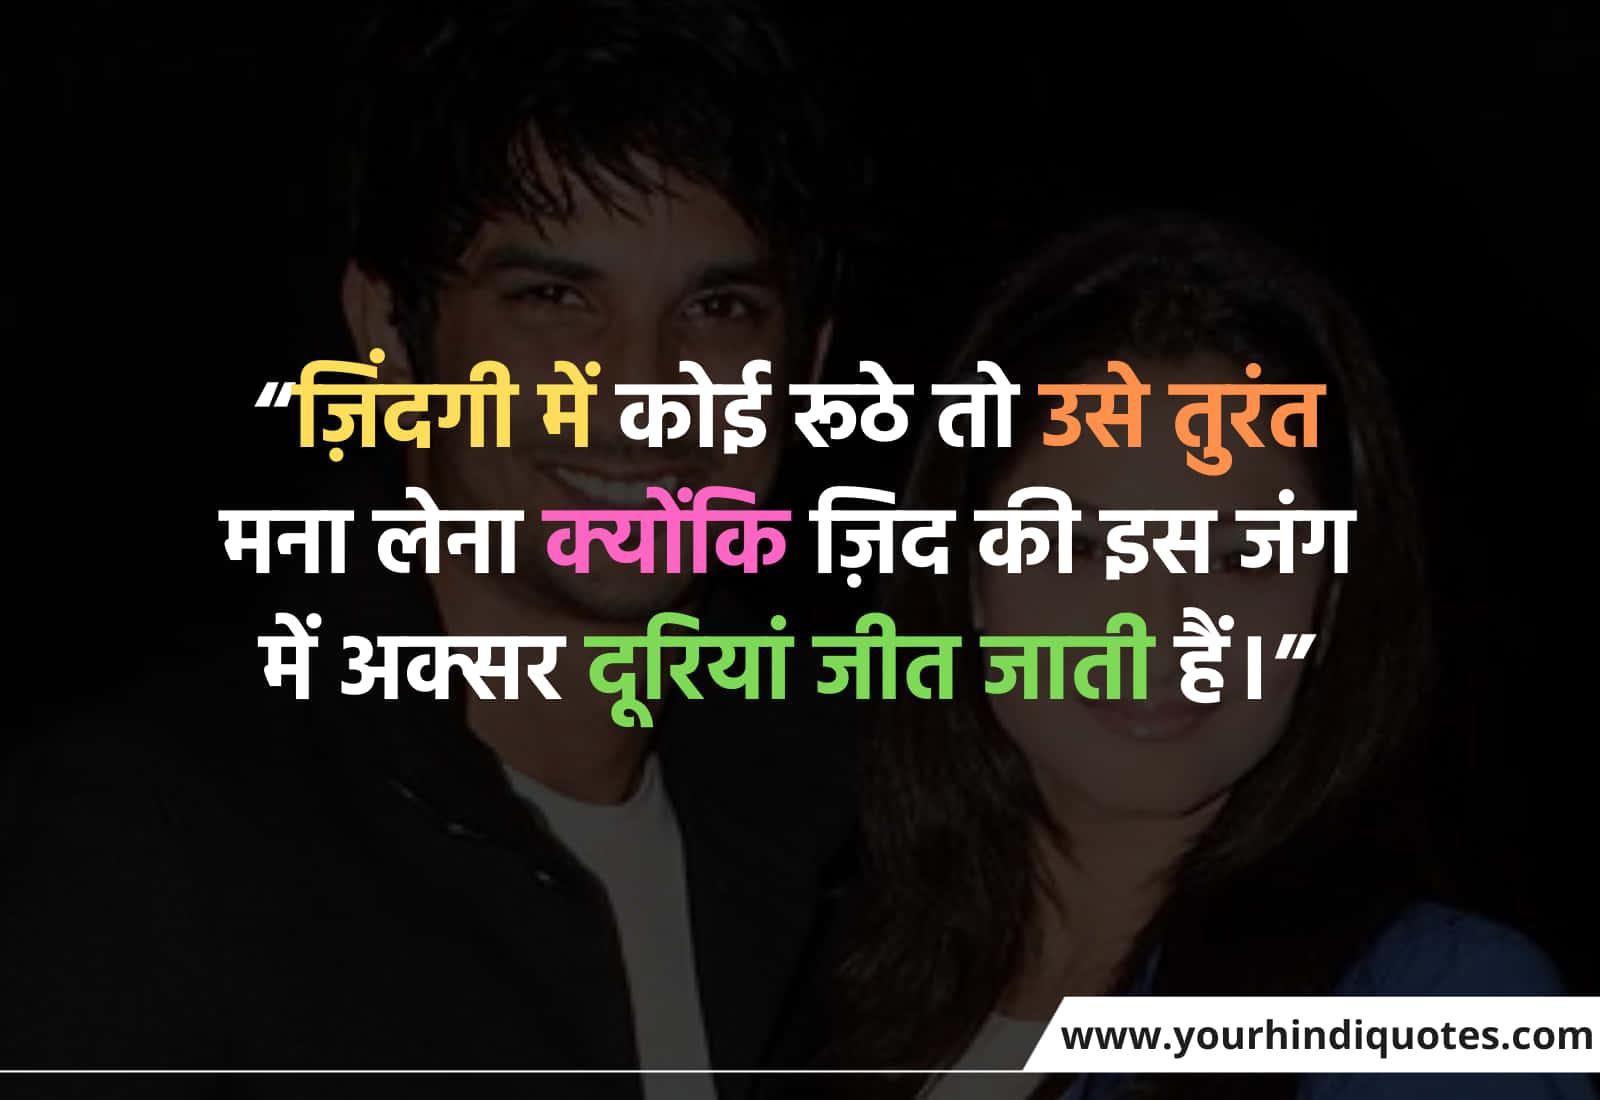 Latest Hindi Relationship Quotes